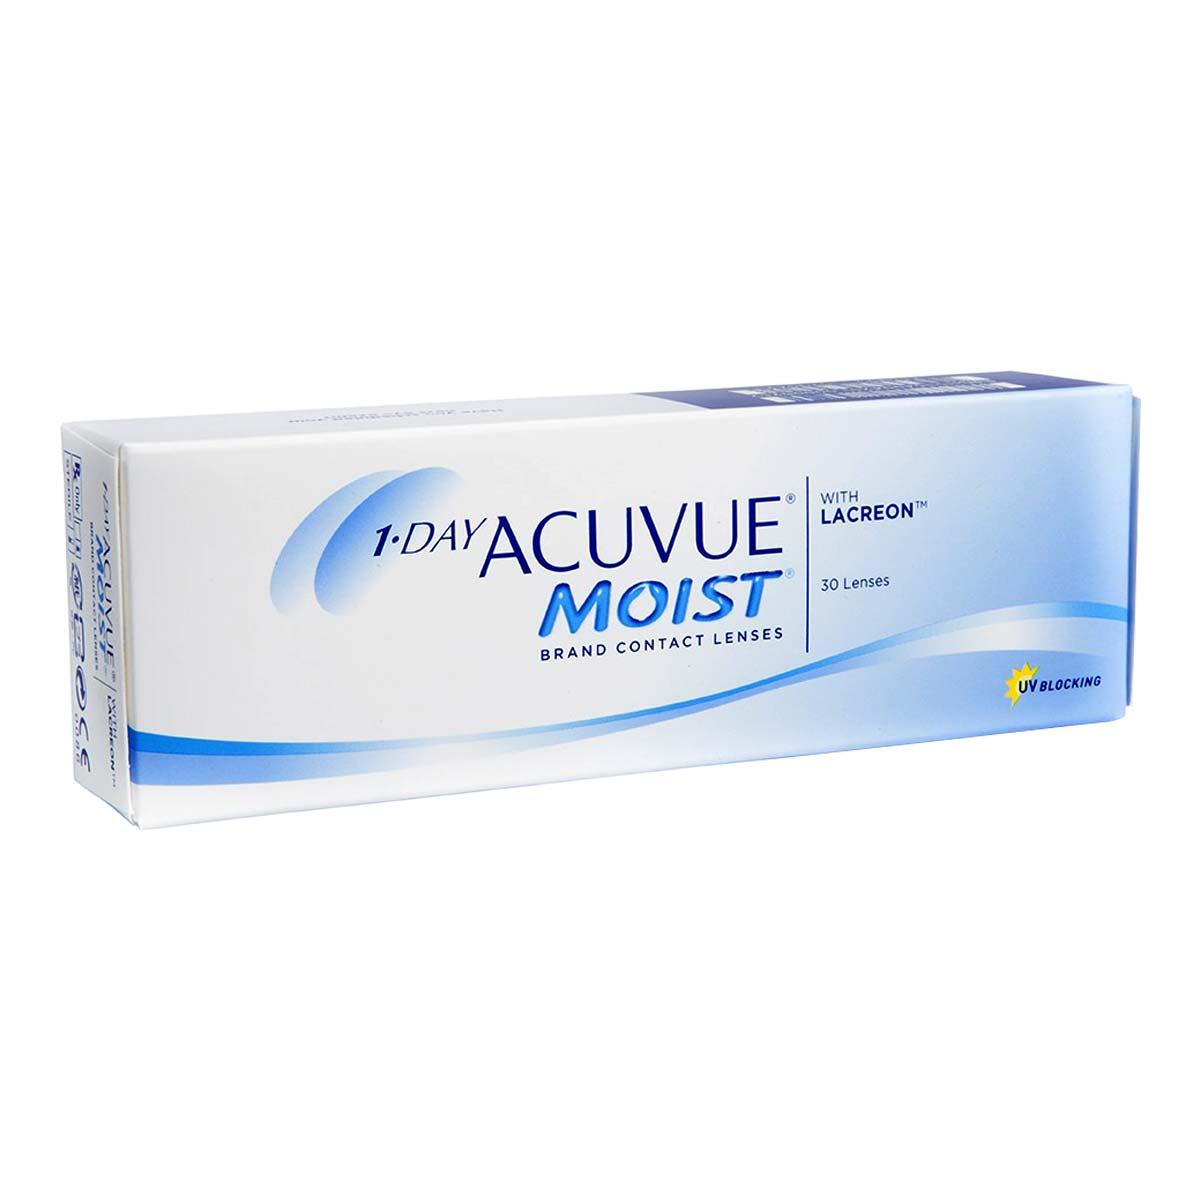 Acuvue 1 Day Acuvue Moist (30 Contact Lenses), Acuvue by Johnson & Johnson, Daily Disposable, Etafilcon A